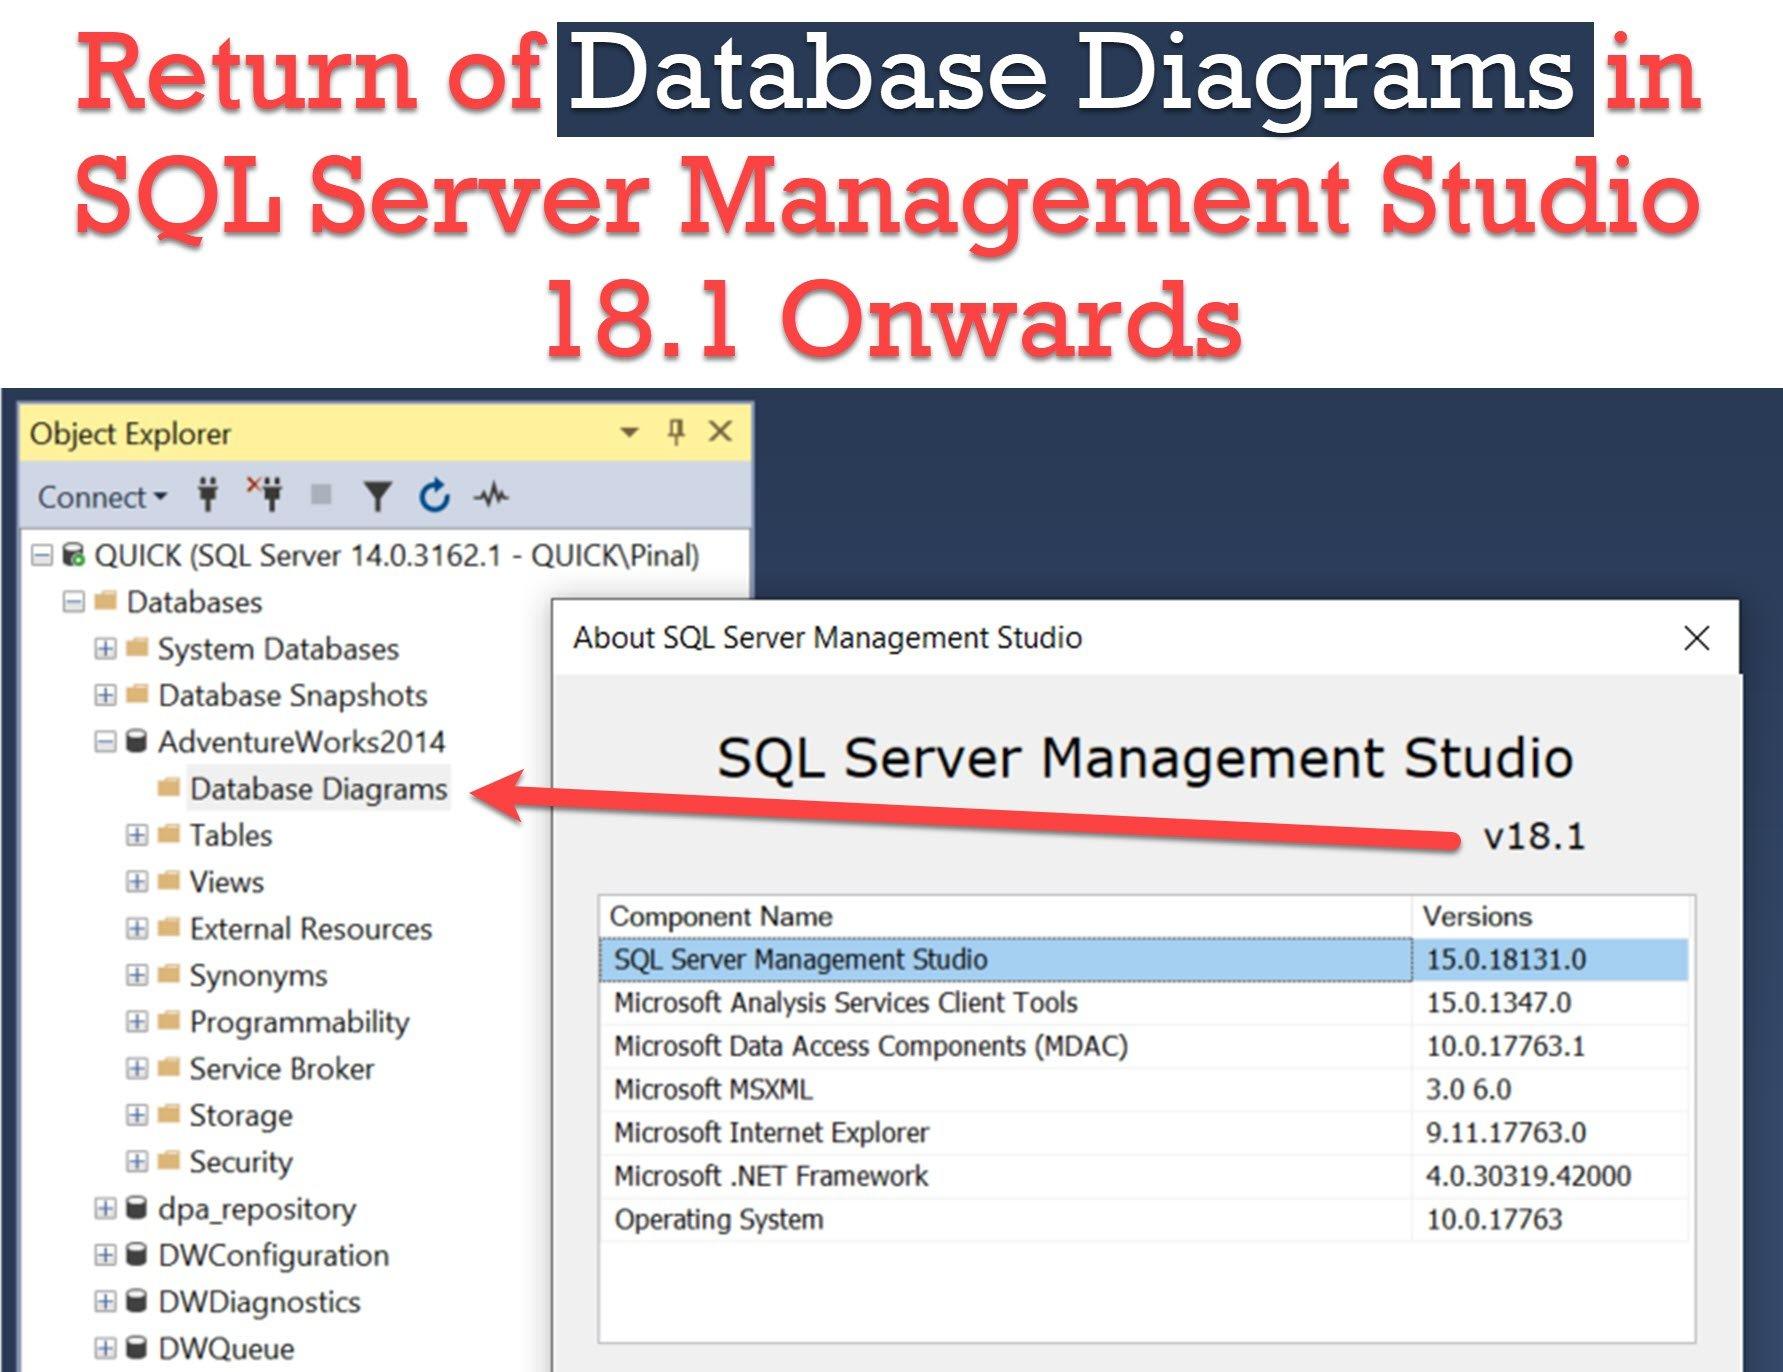 Database Diagram - Available Again In Sql Server Management